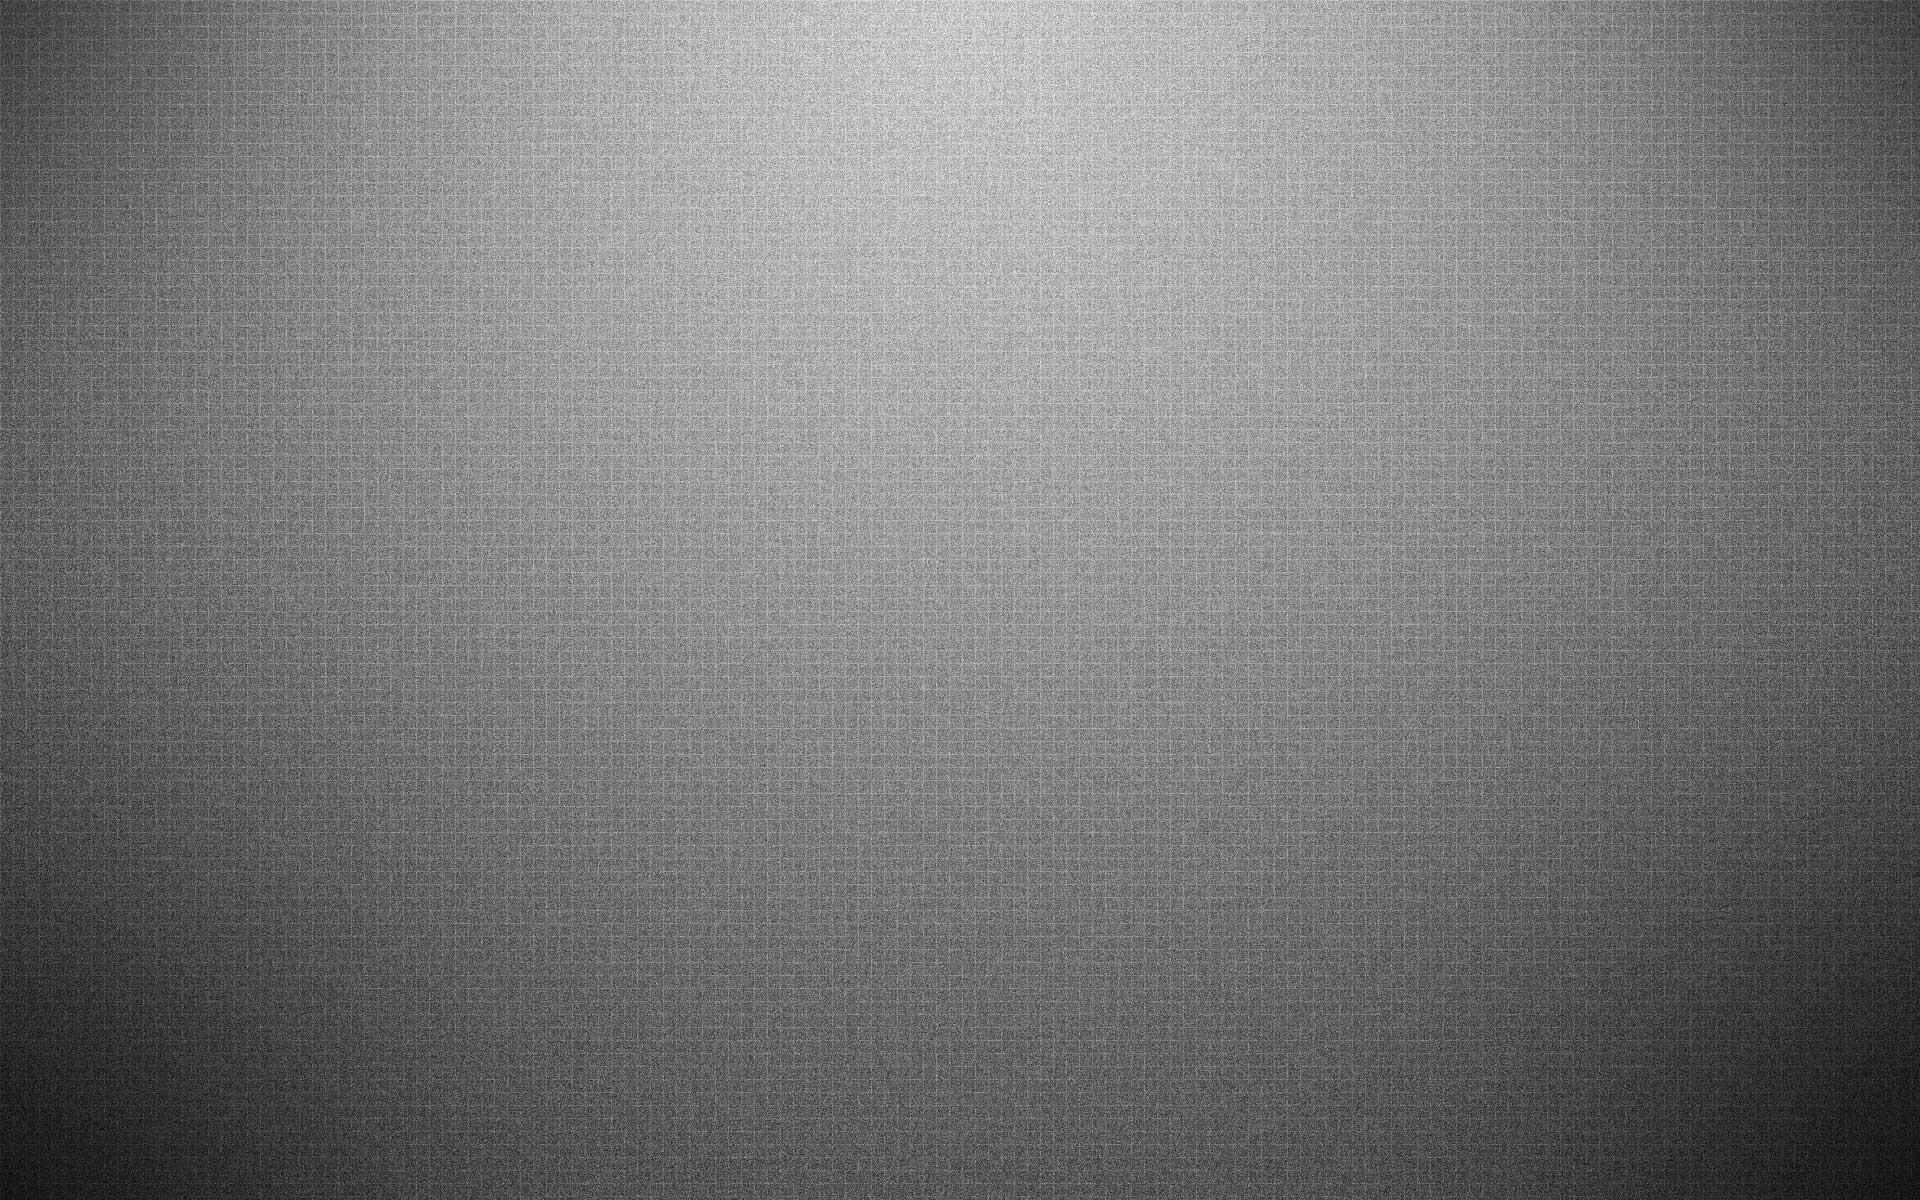 8589130421782-grey-plain-wallpaper-hd